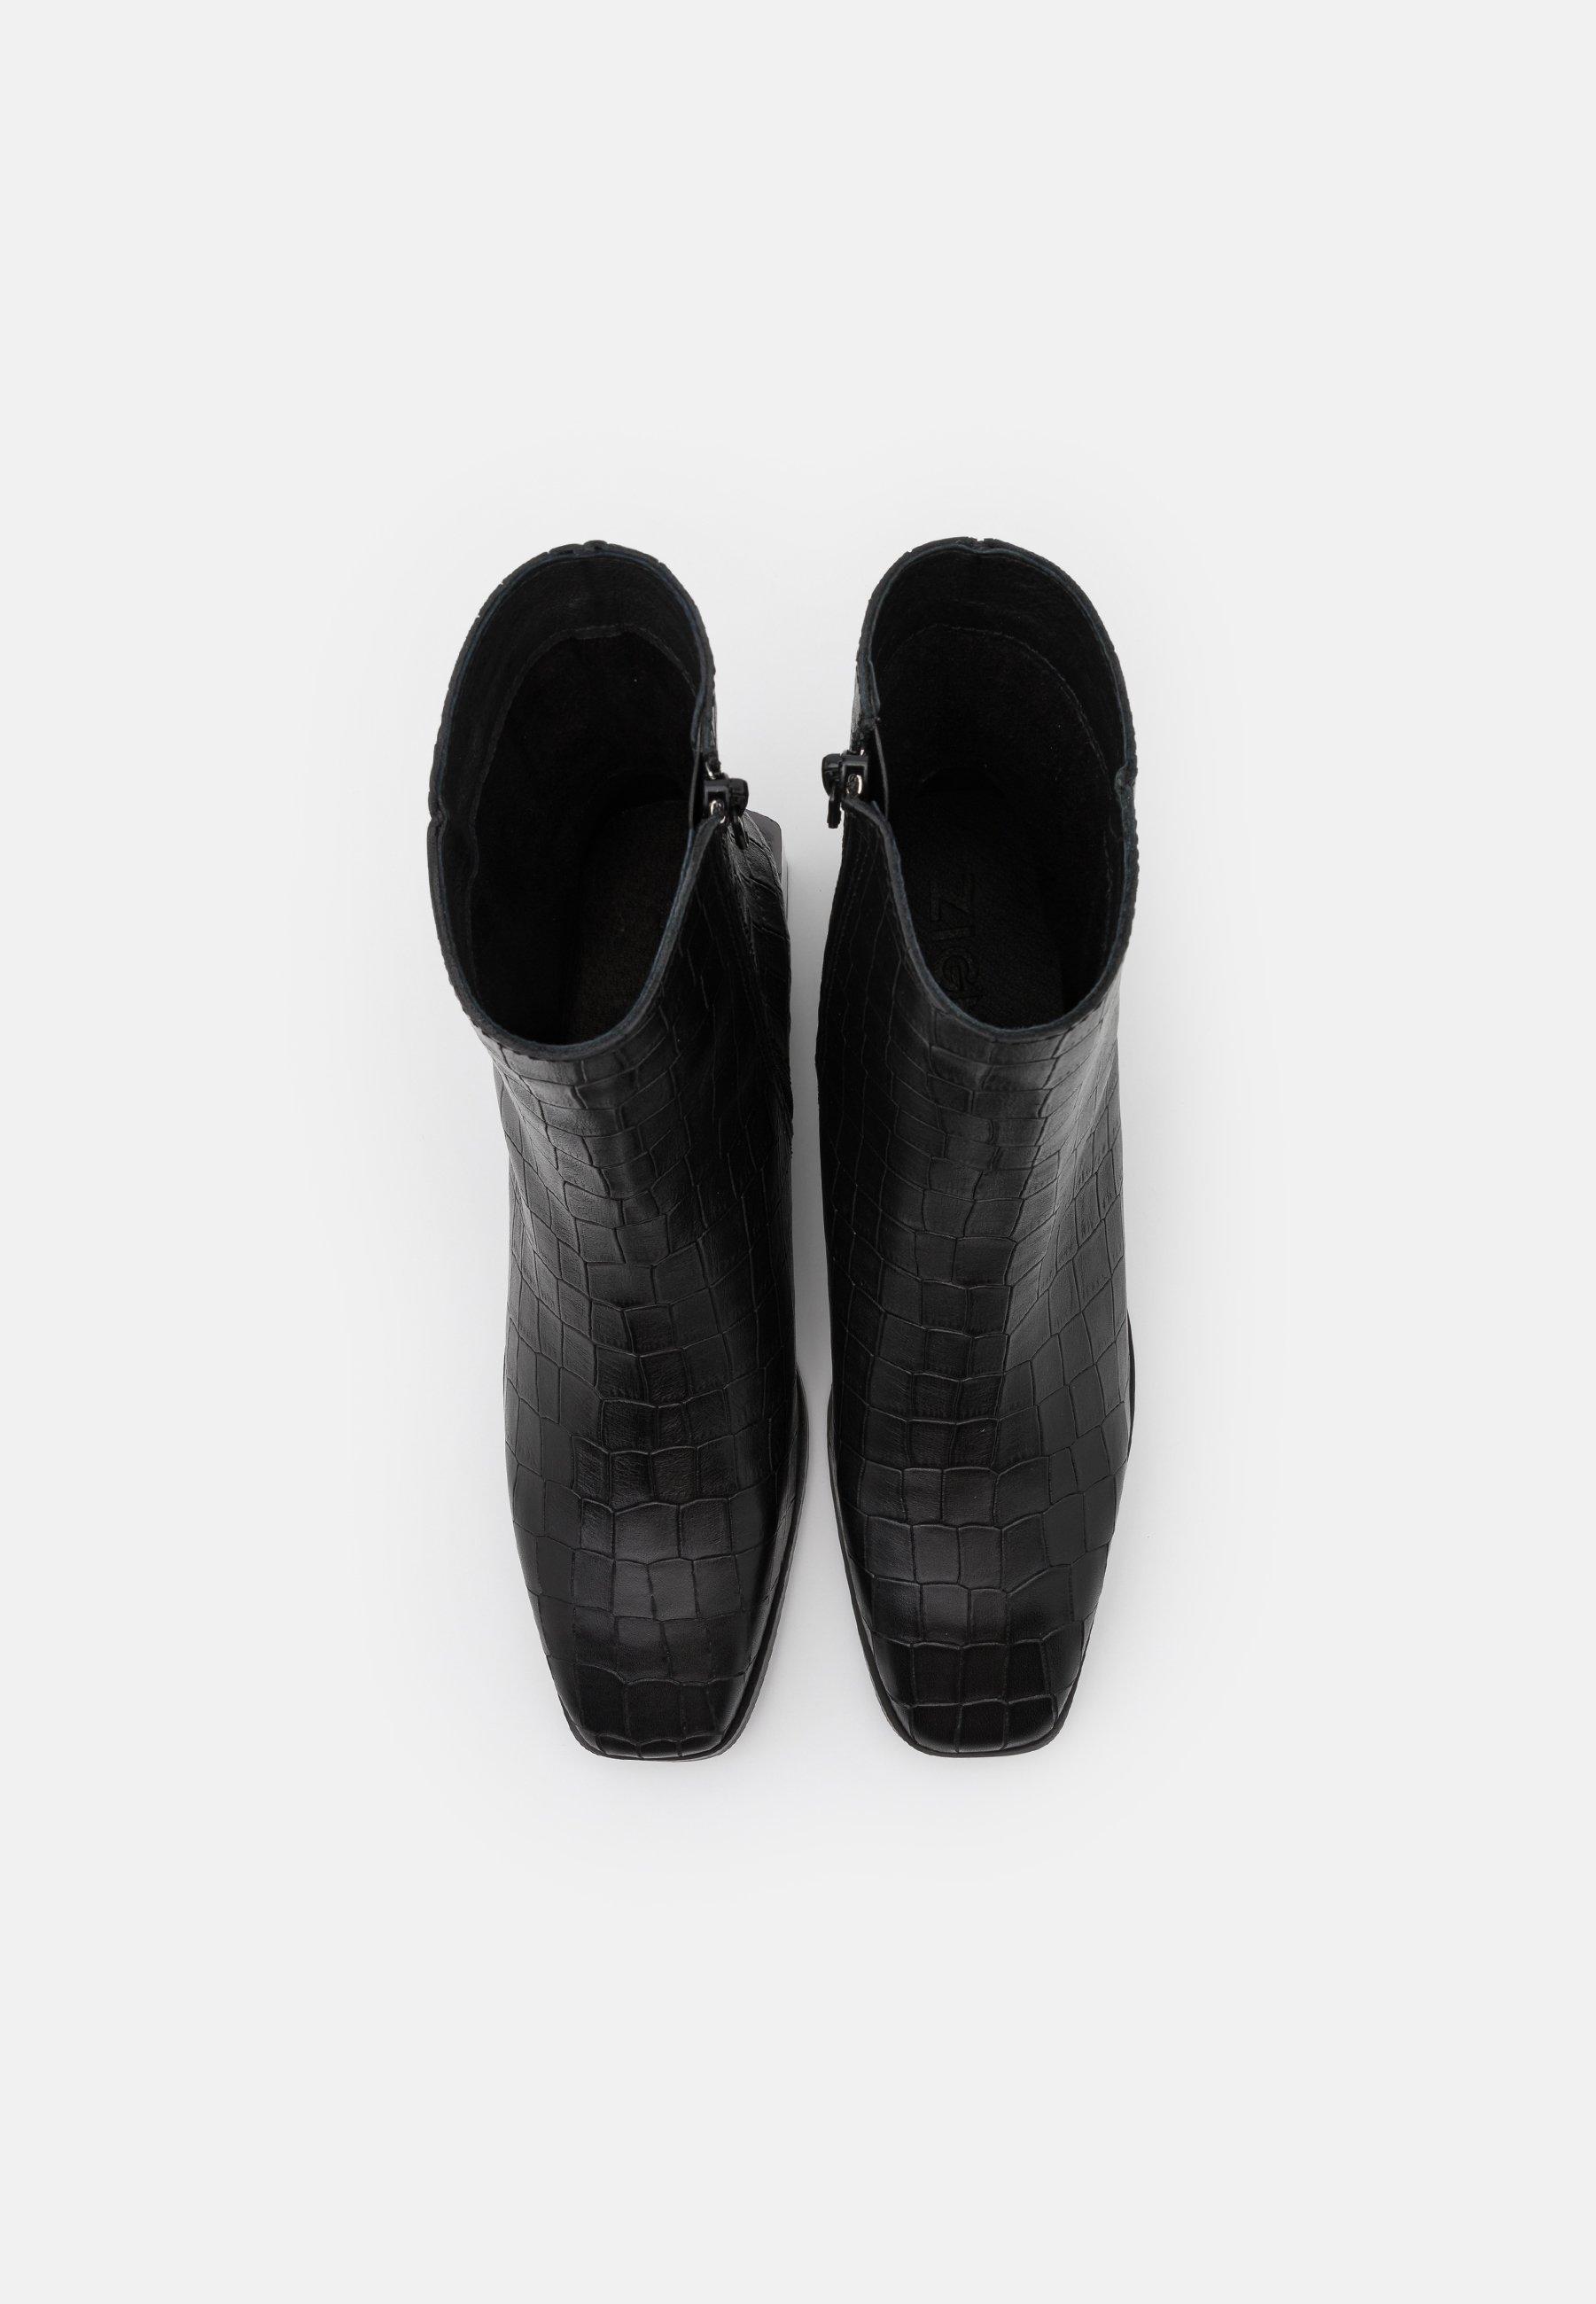 Zign Stiefelette black/schwarz